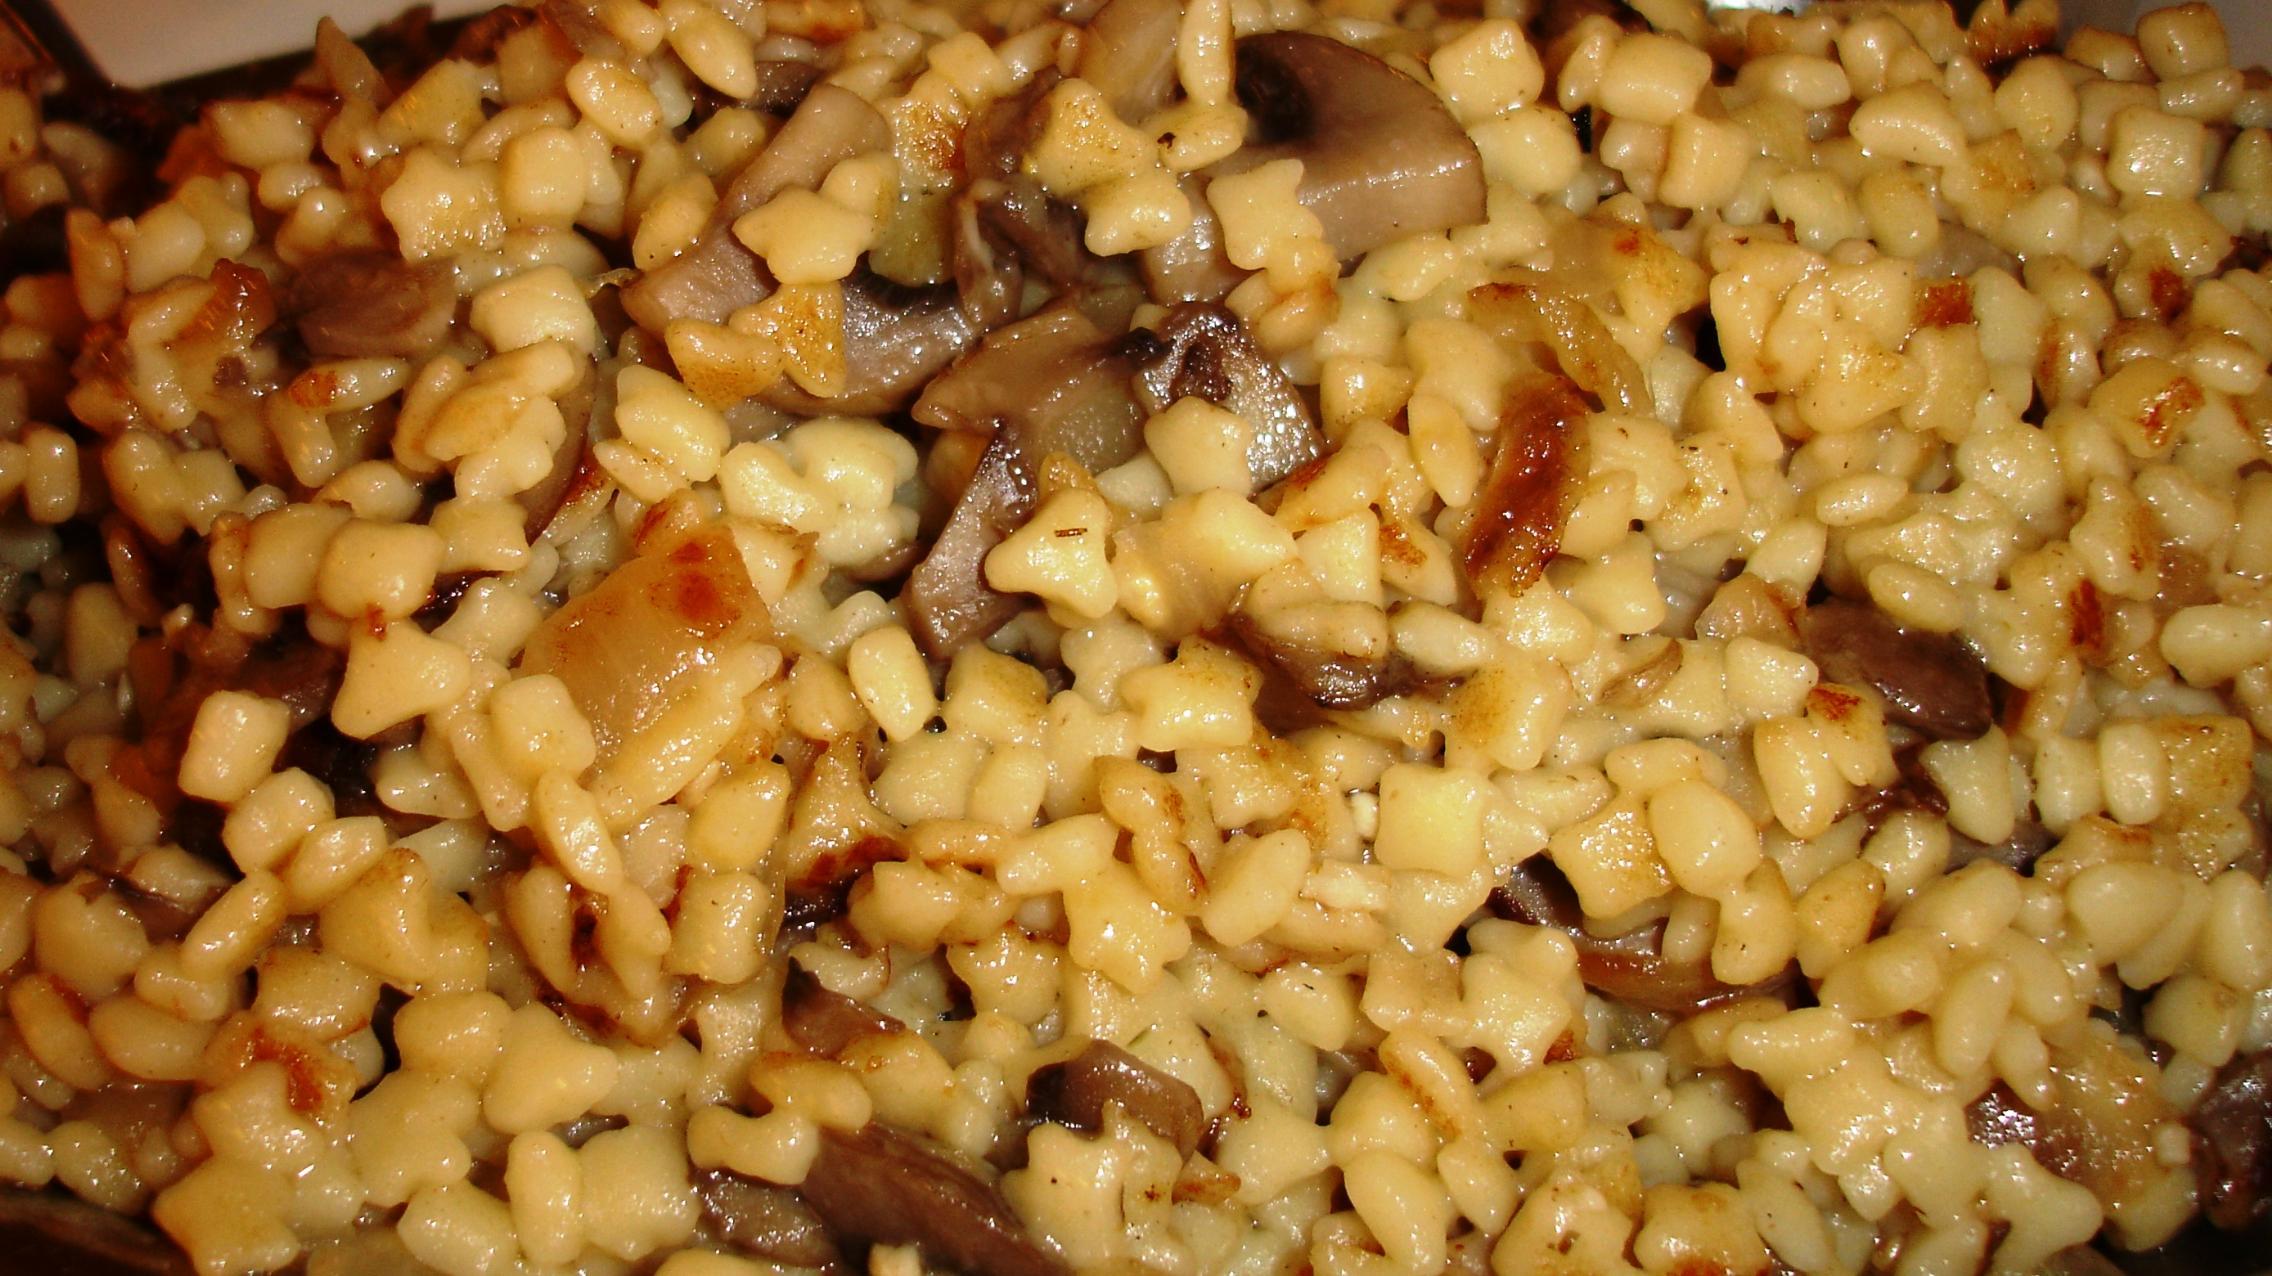 The dish listed as Mushroom - Egg - Barley is like a moist, mushroomy pasta-based stuffing, along the lines of matzo farfel and kasha varnishkes.